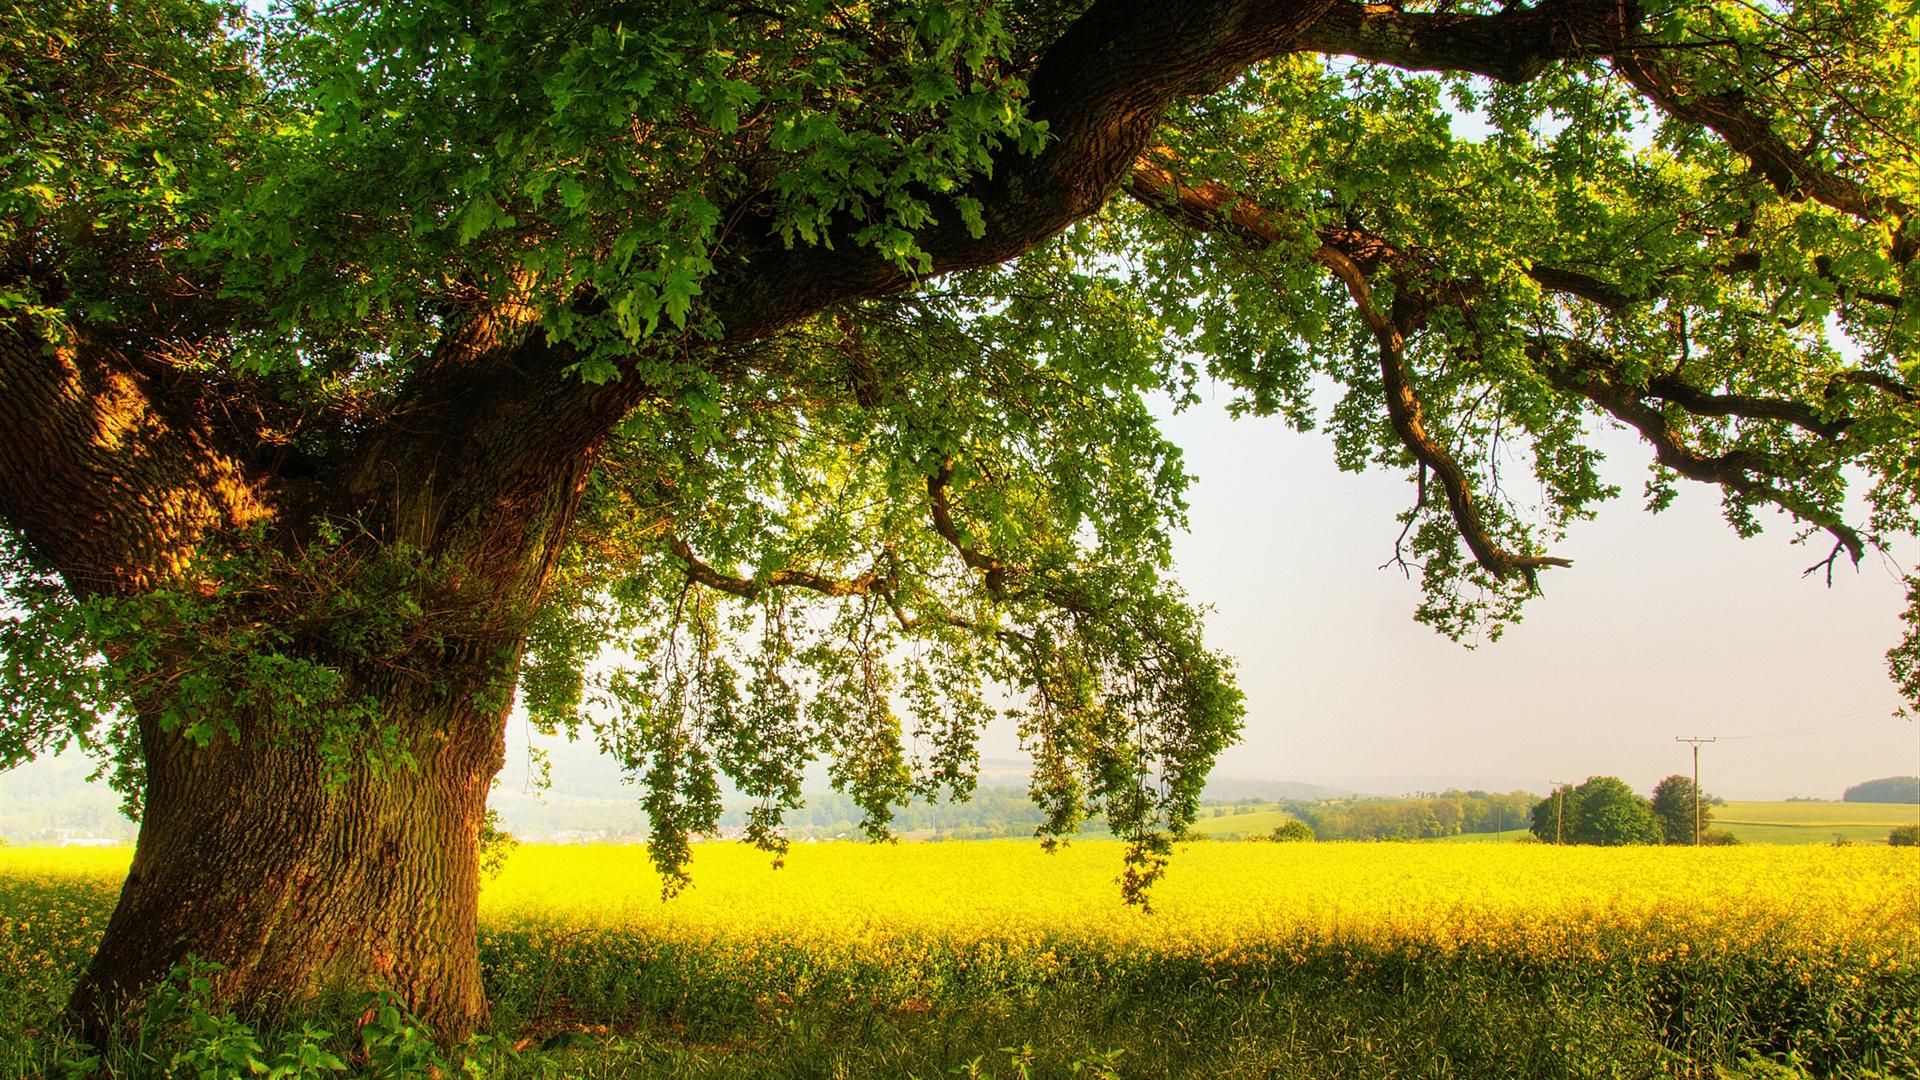 oak tree nature